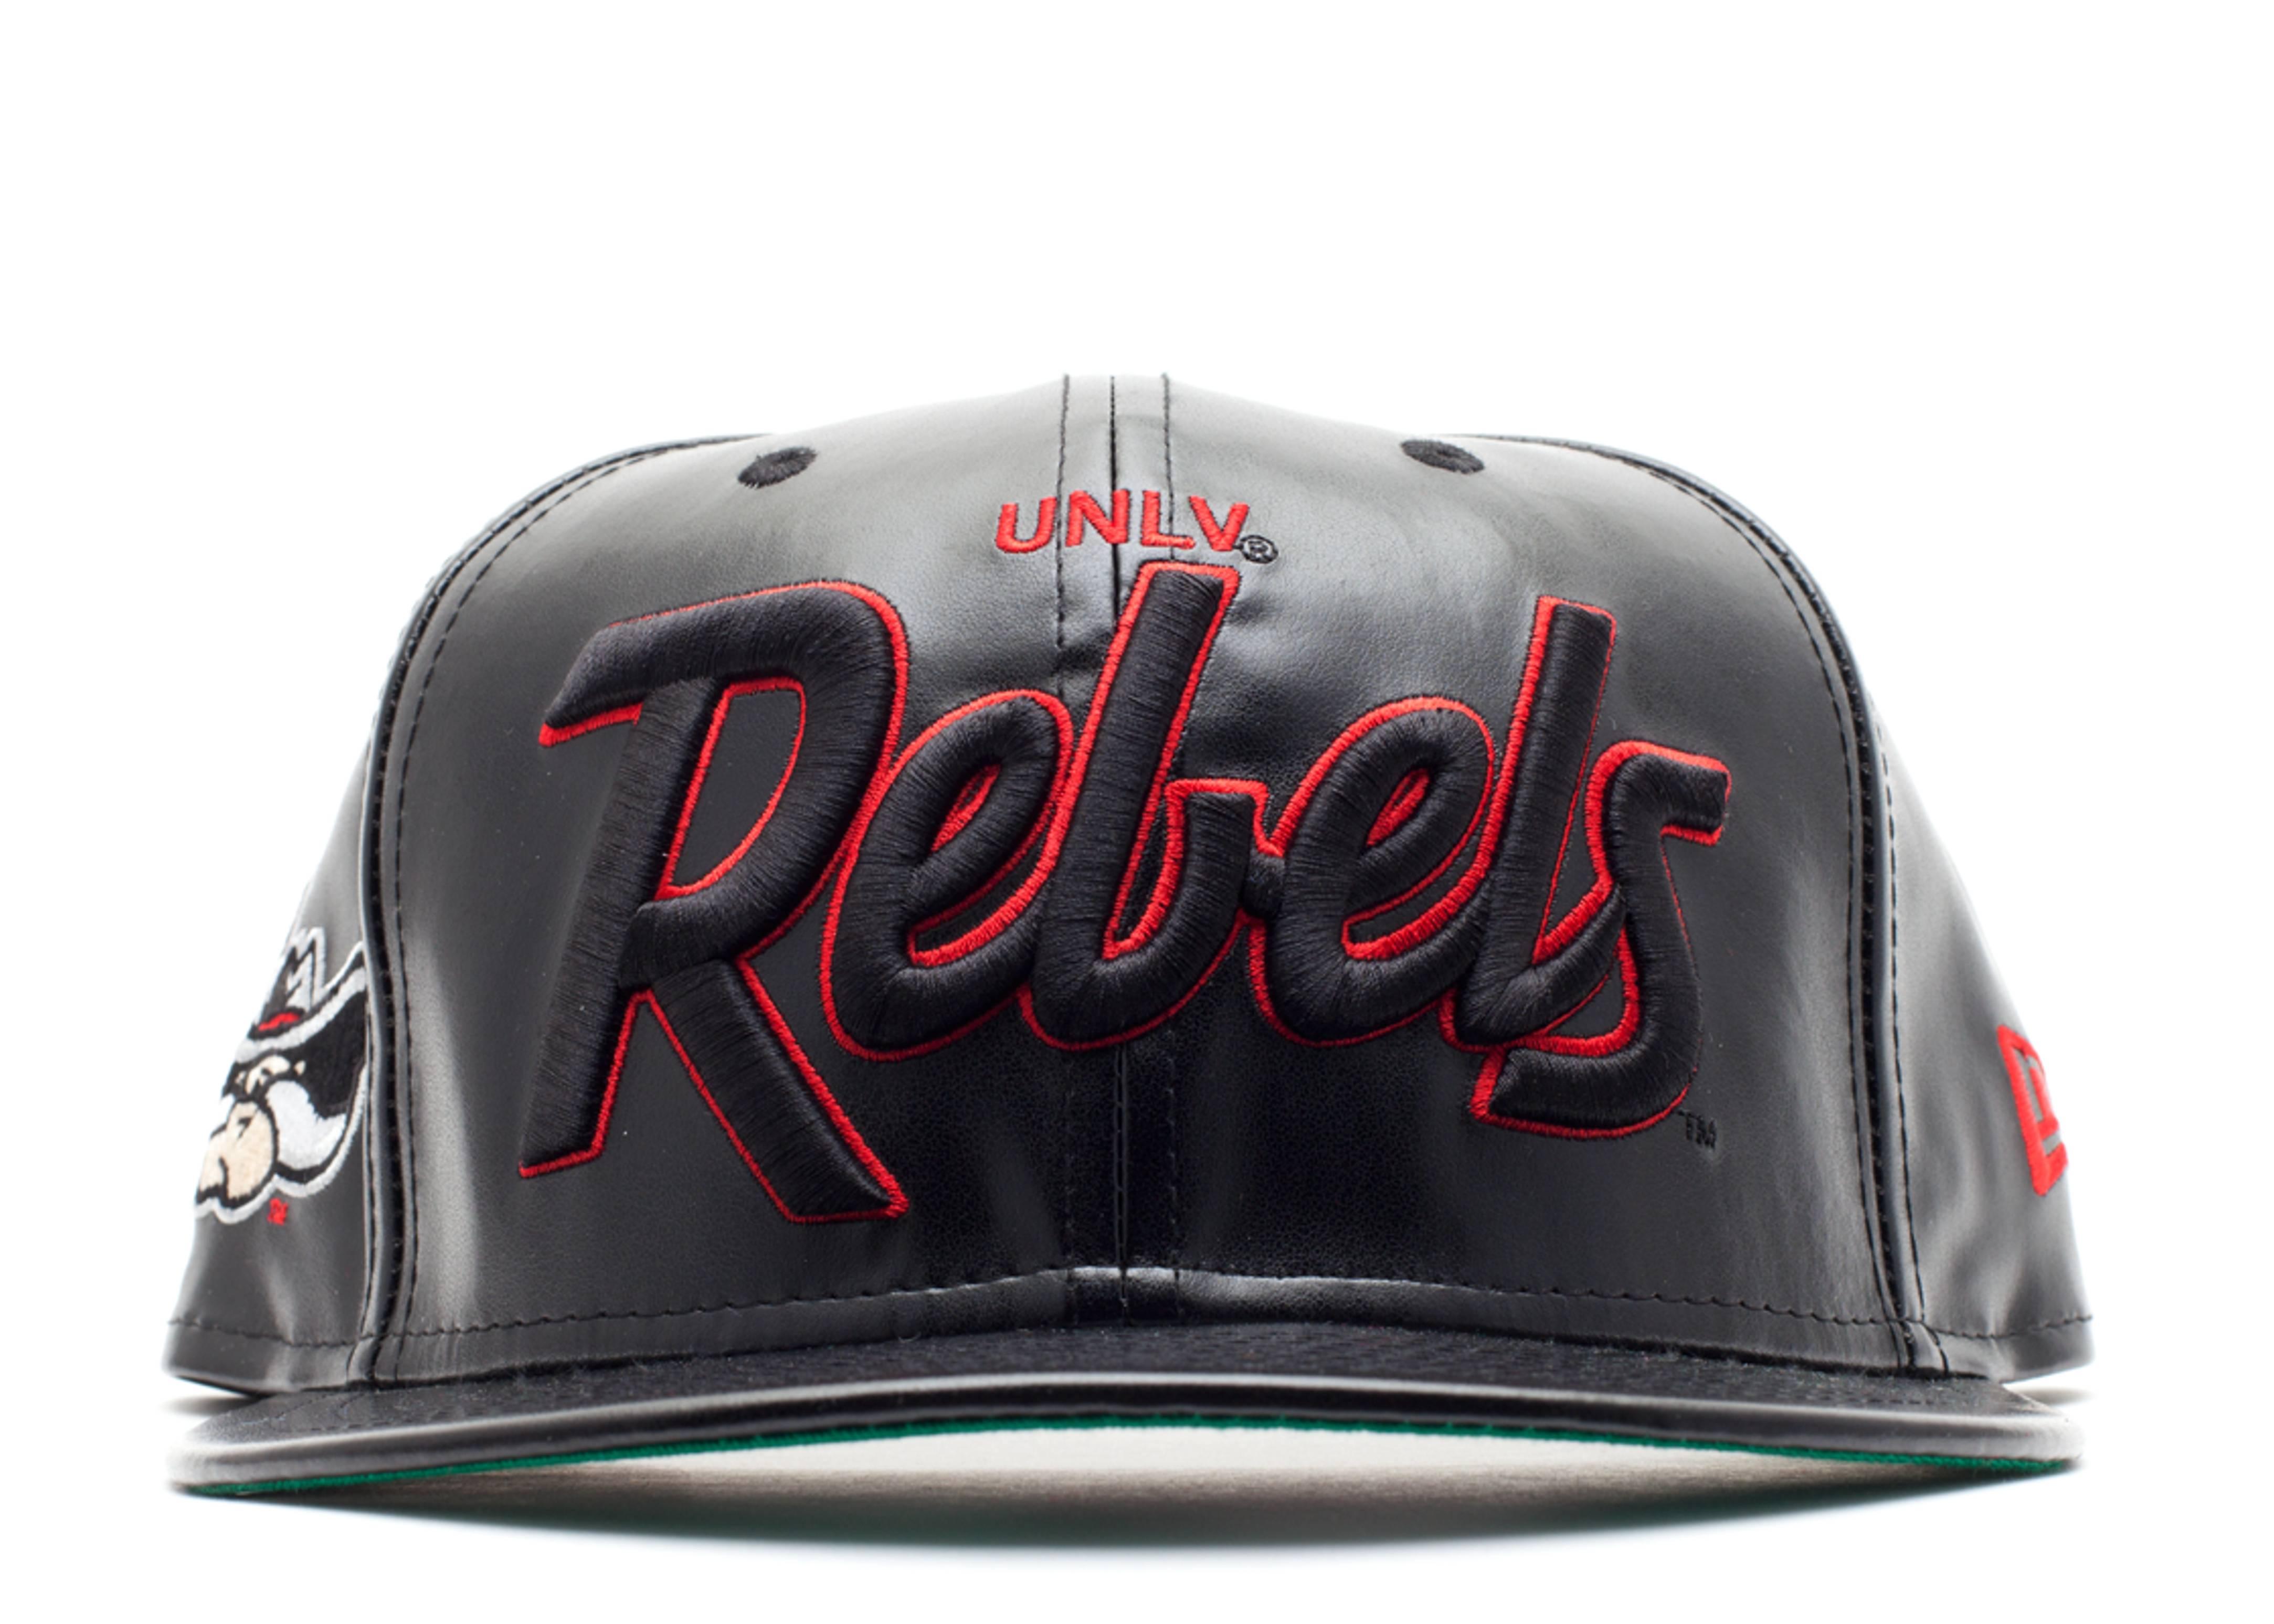 unlv rebels redux snap-back